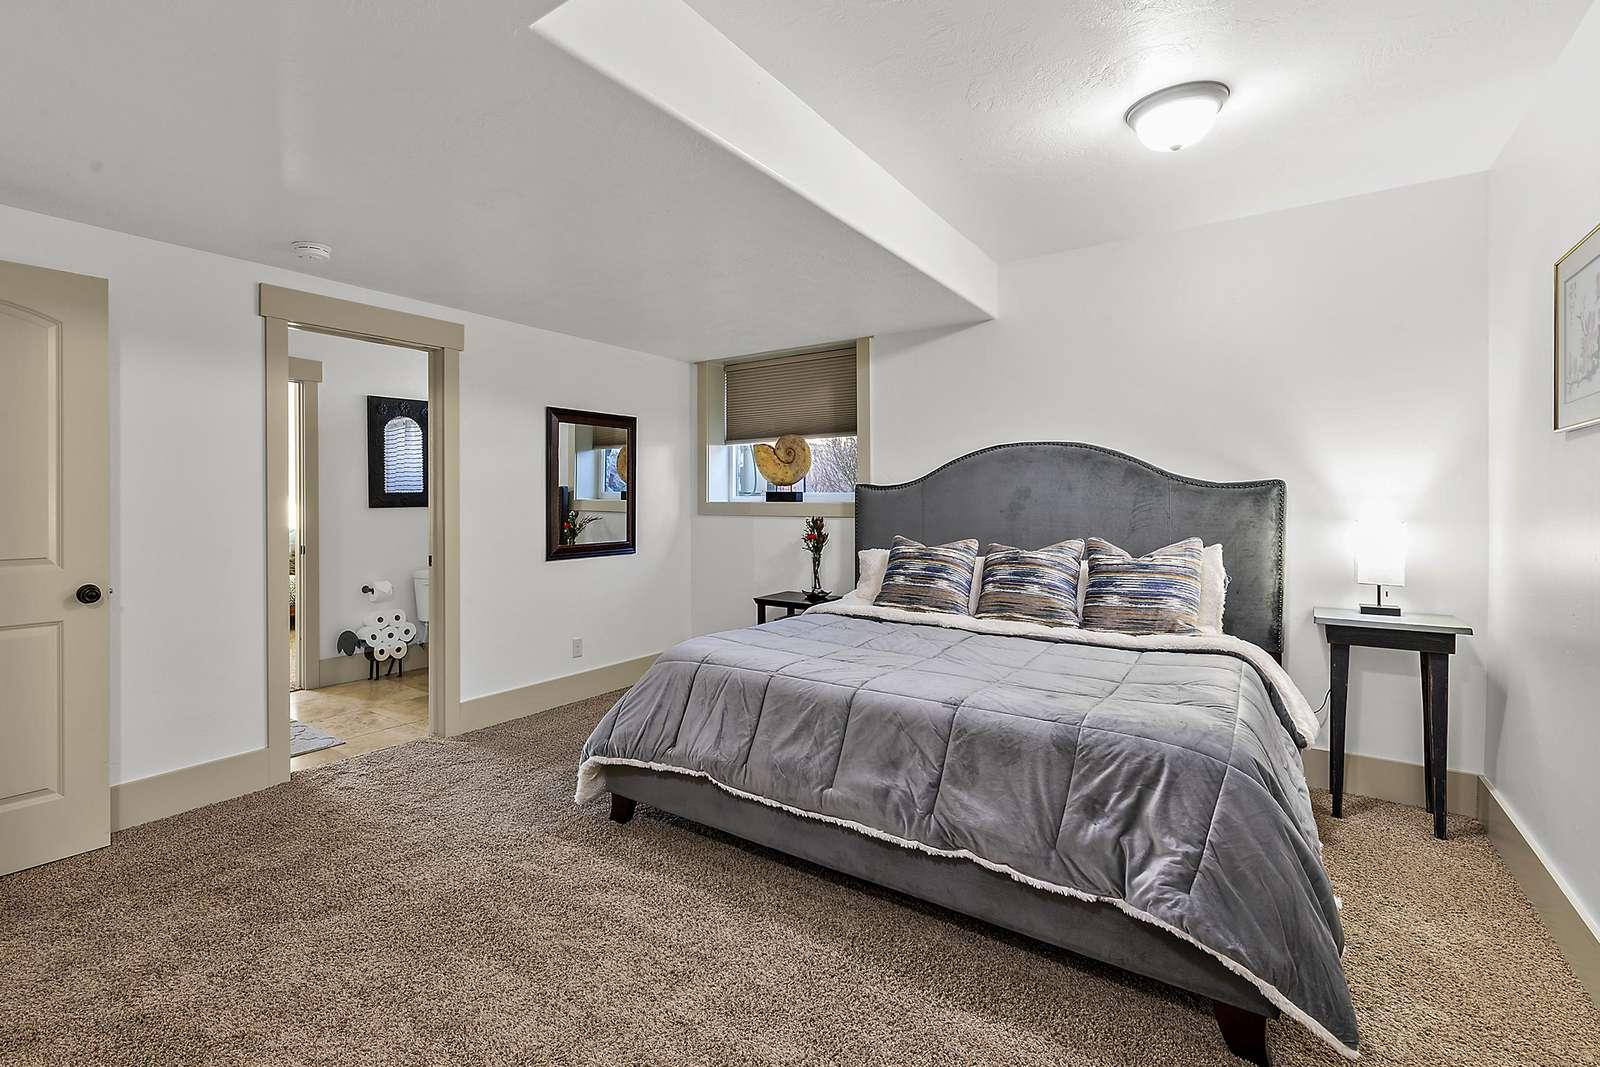 Master bedroom with en-suite bathroom